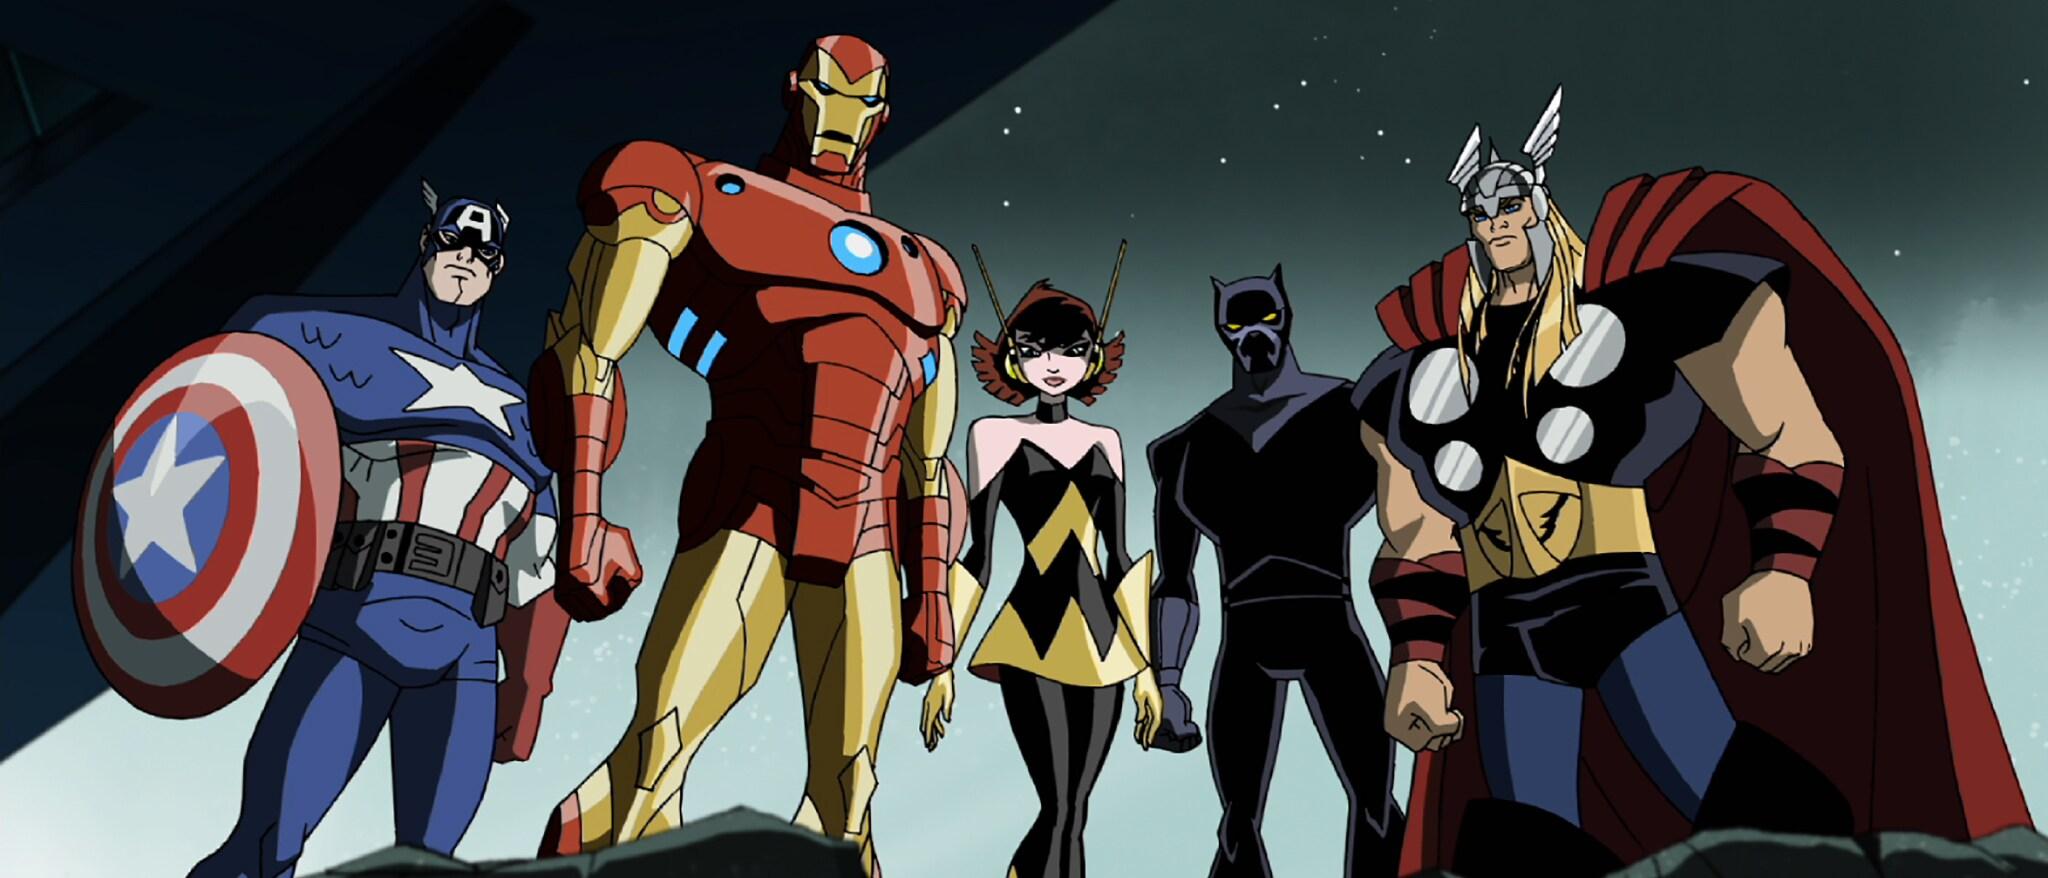 The Avengers: Earth's Mightiest Heroes Hero